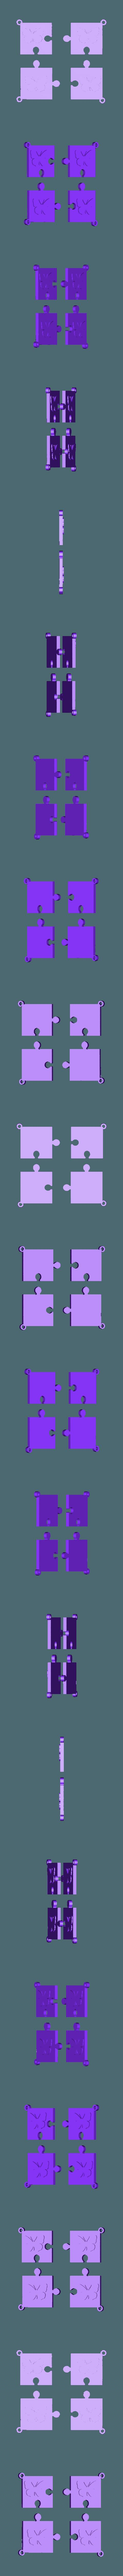 puzzle papîllon.stl Download STL file puzzle key ring • 3D printing design, catf3d